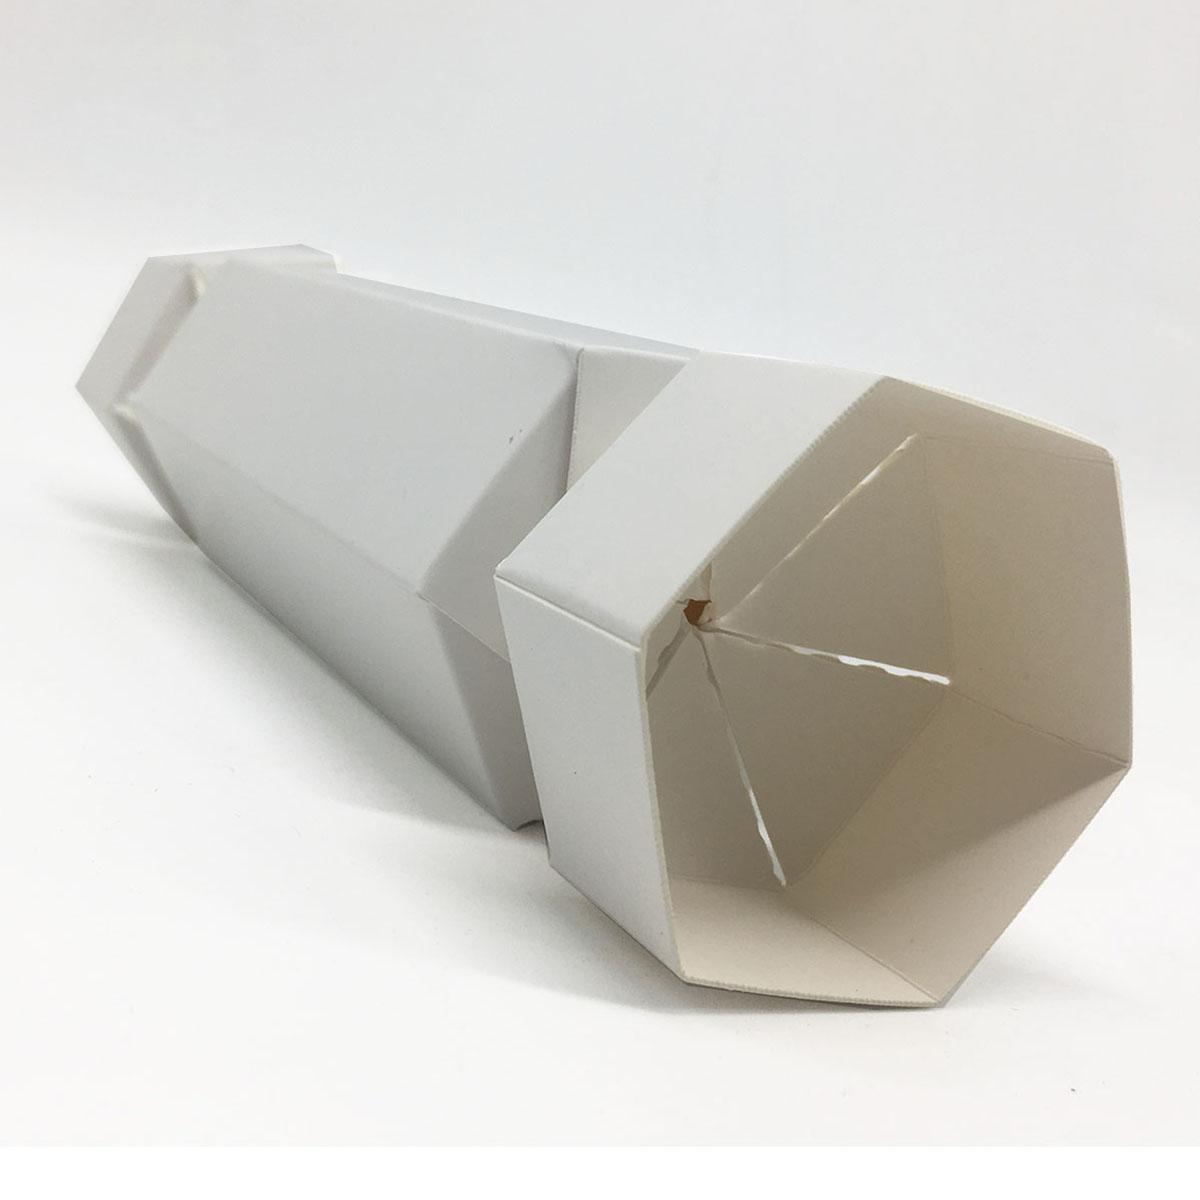 news-How to make Candy gift box for kids-Mingyi Printing-img